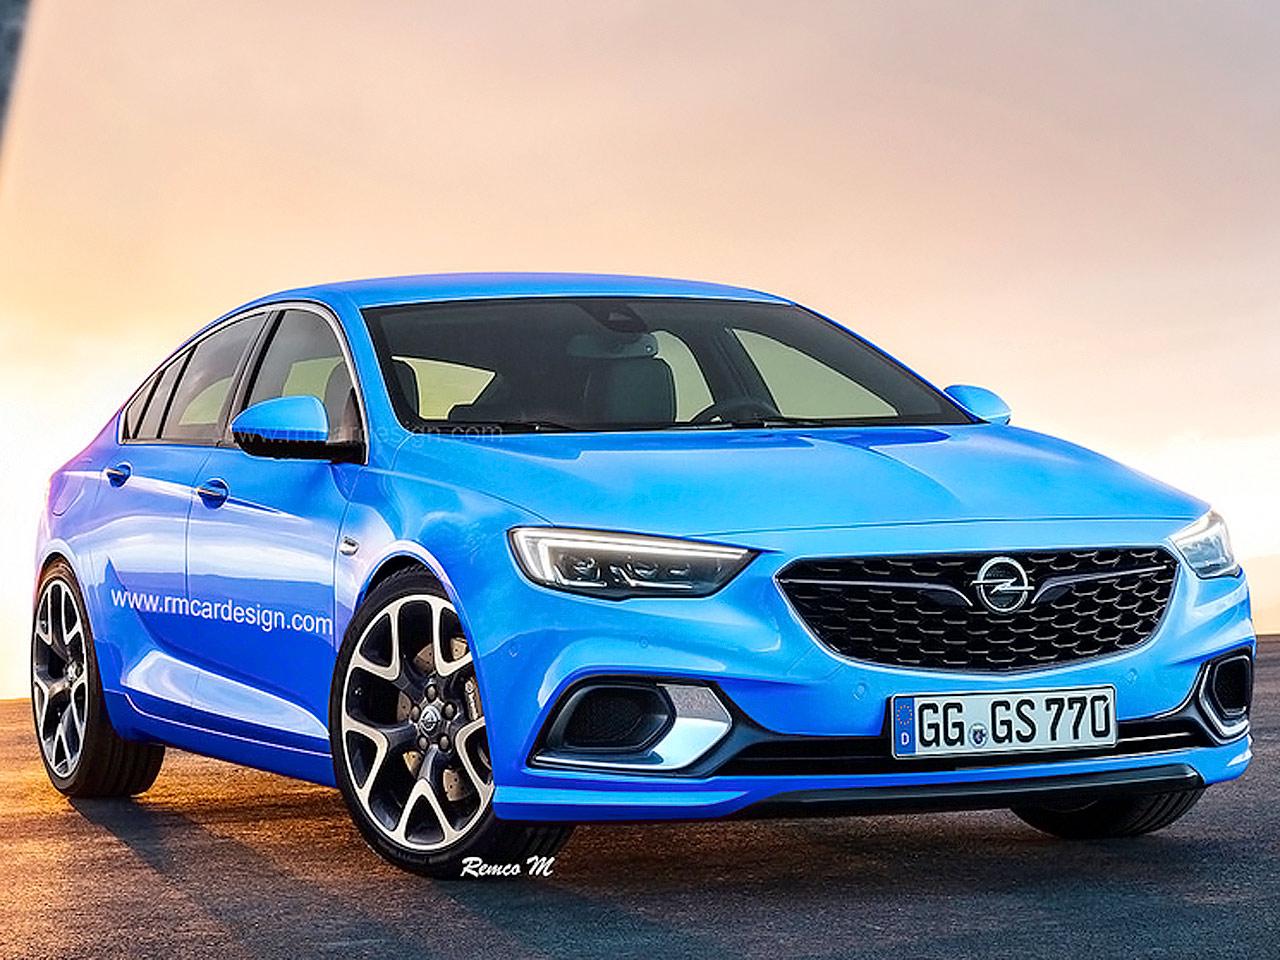 Opel Insignia Opc Illustration Autozeitung De